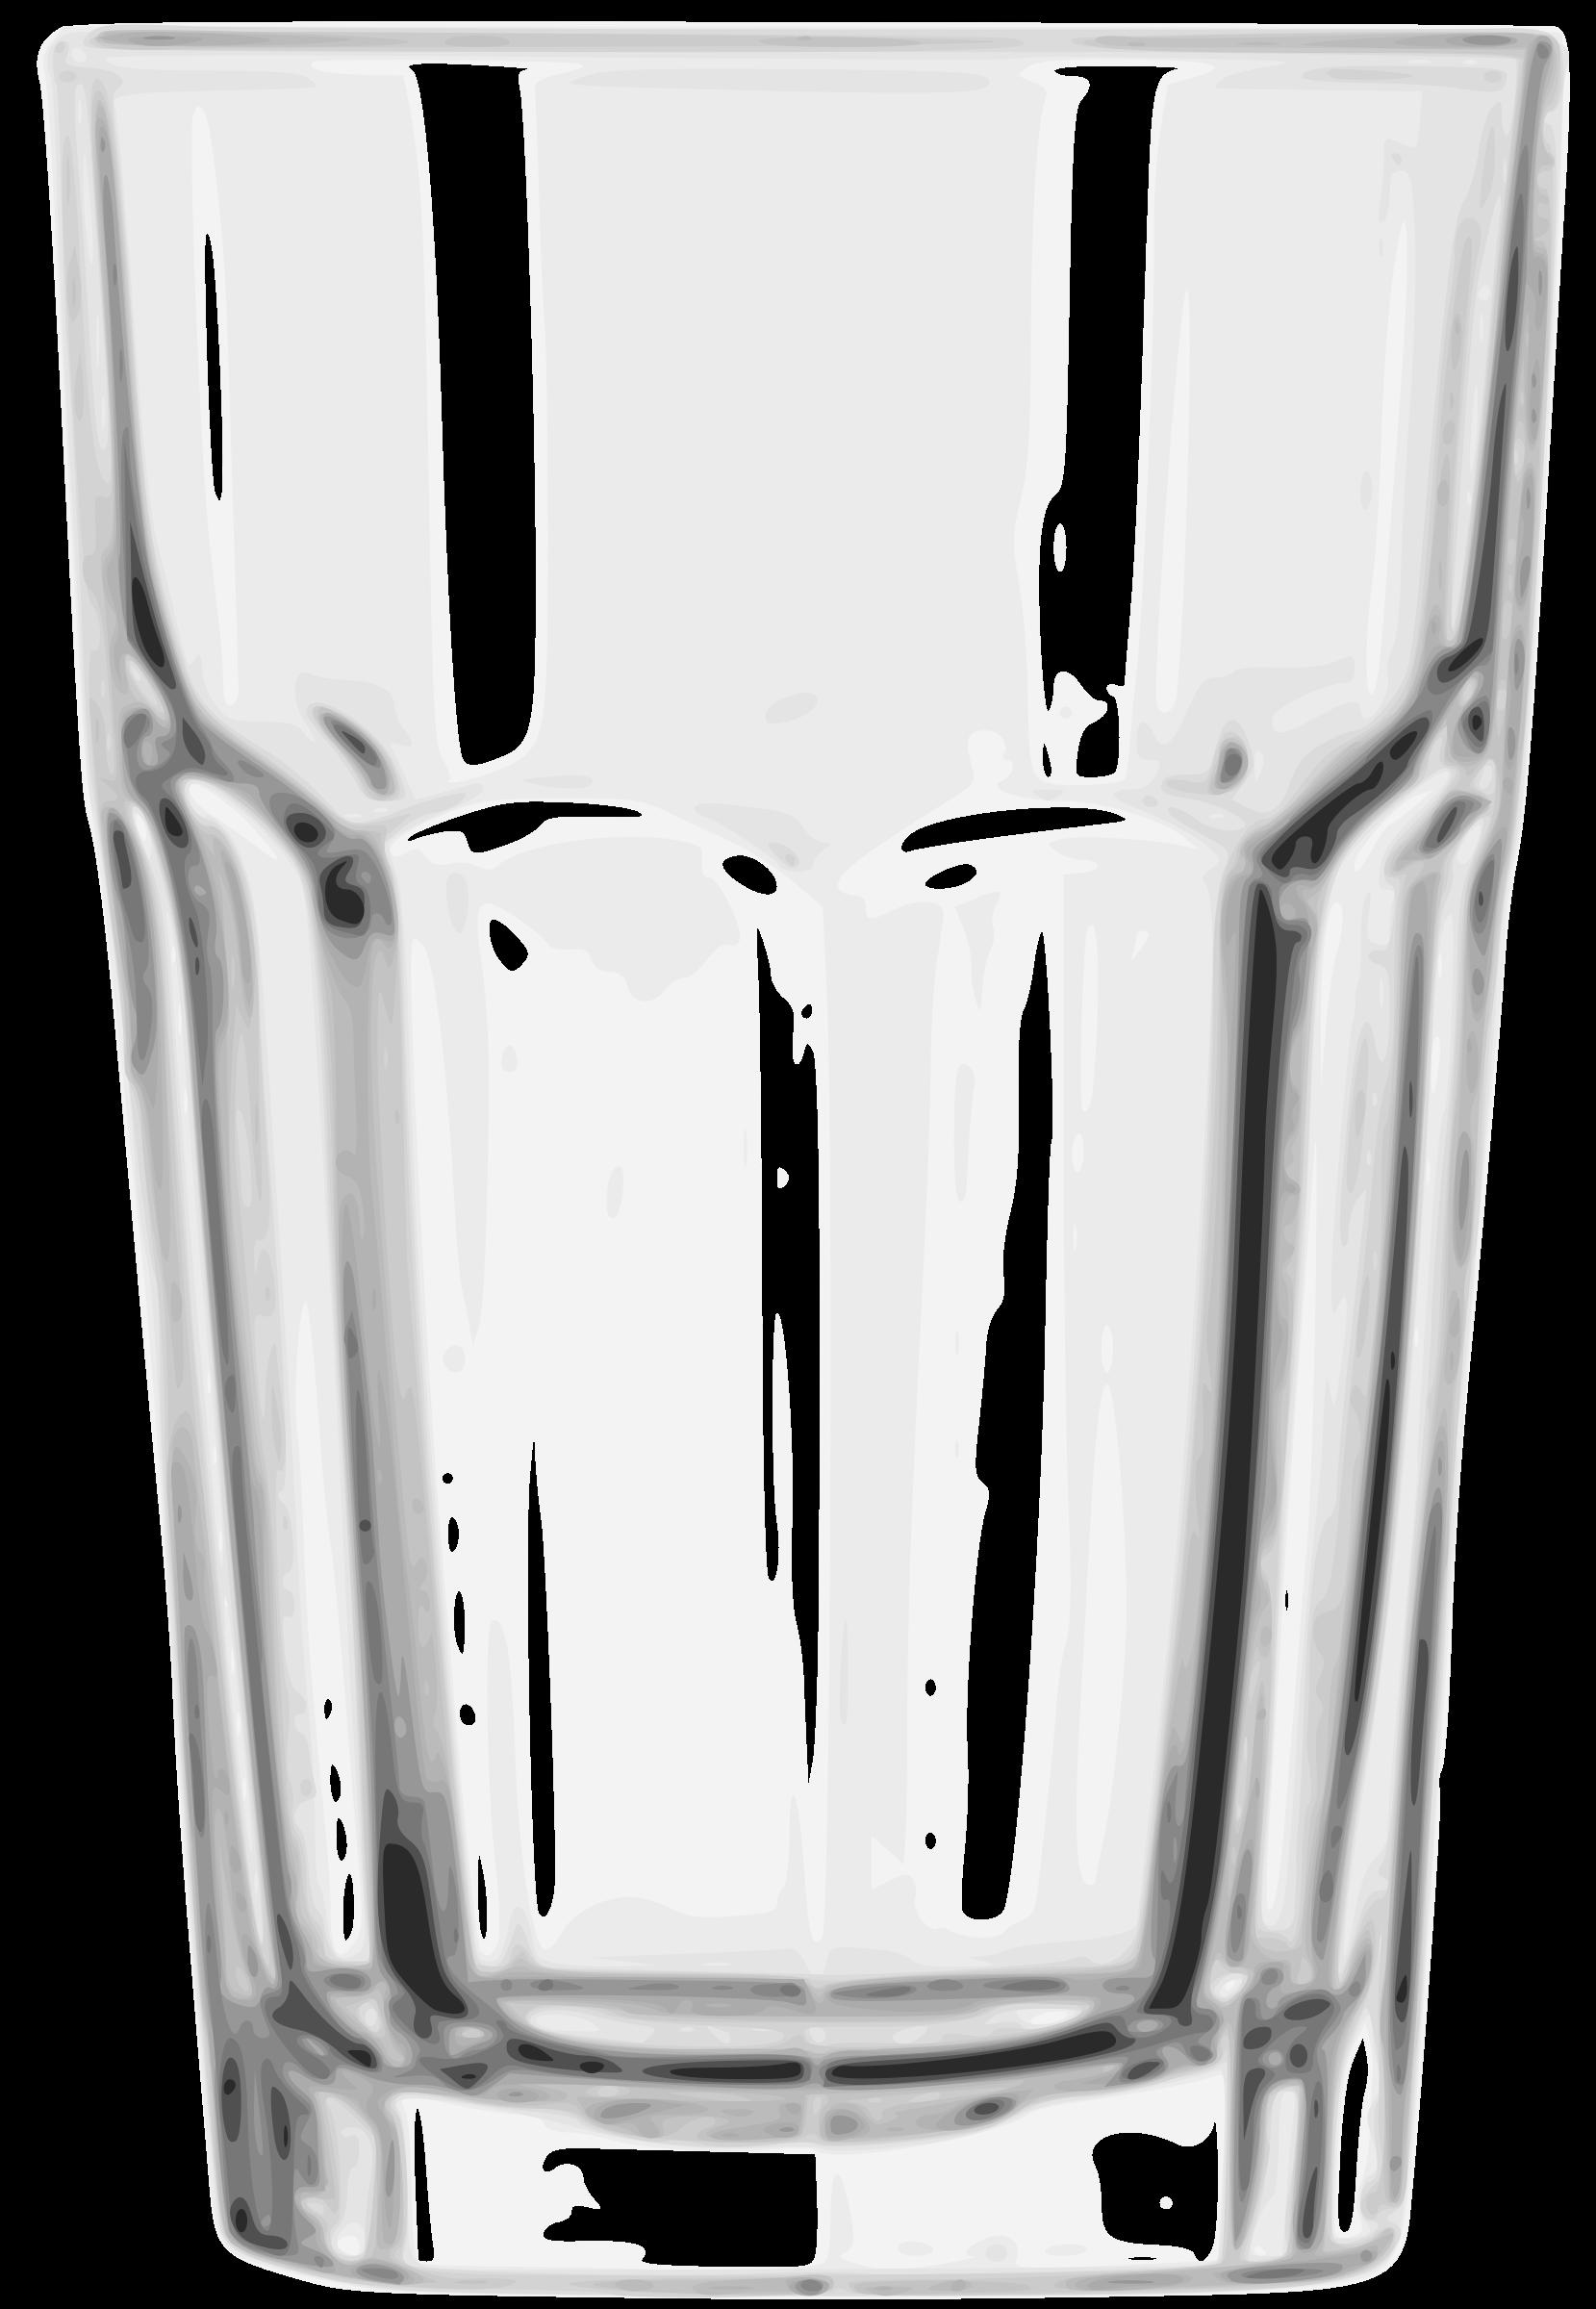 Beverage big image png. Glass clipart glass tumbler